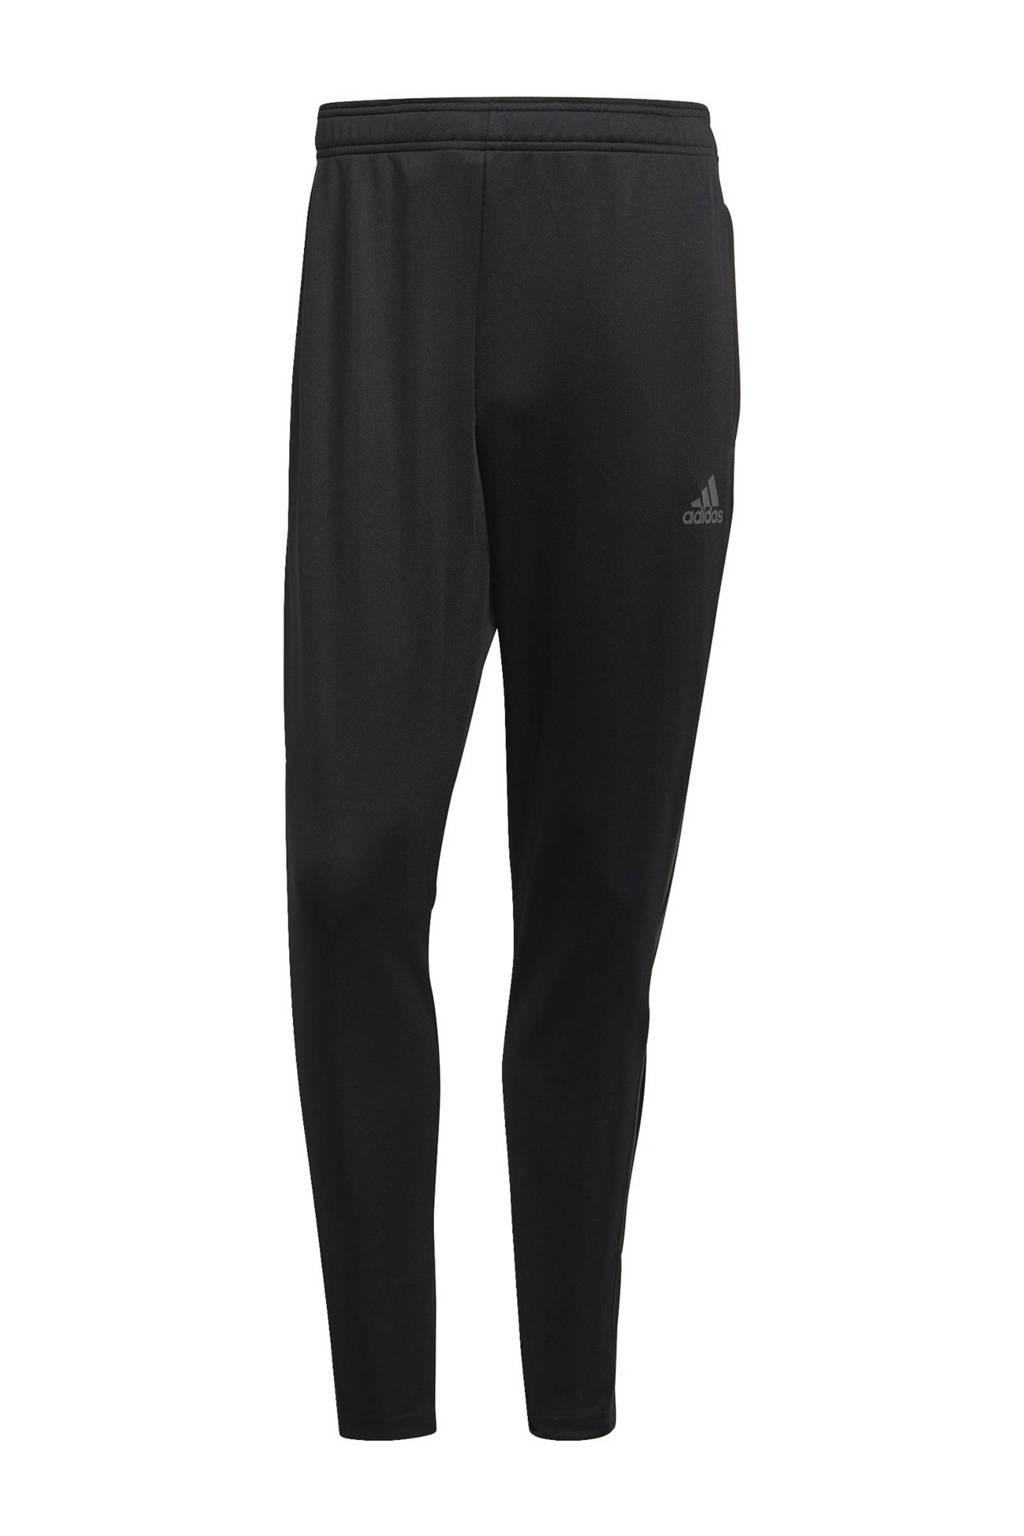 adidas Performance Senior  Tiro trainingsbroek zwart/grijs, Zwart/grijs